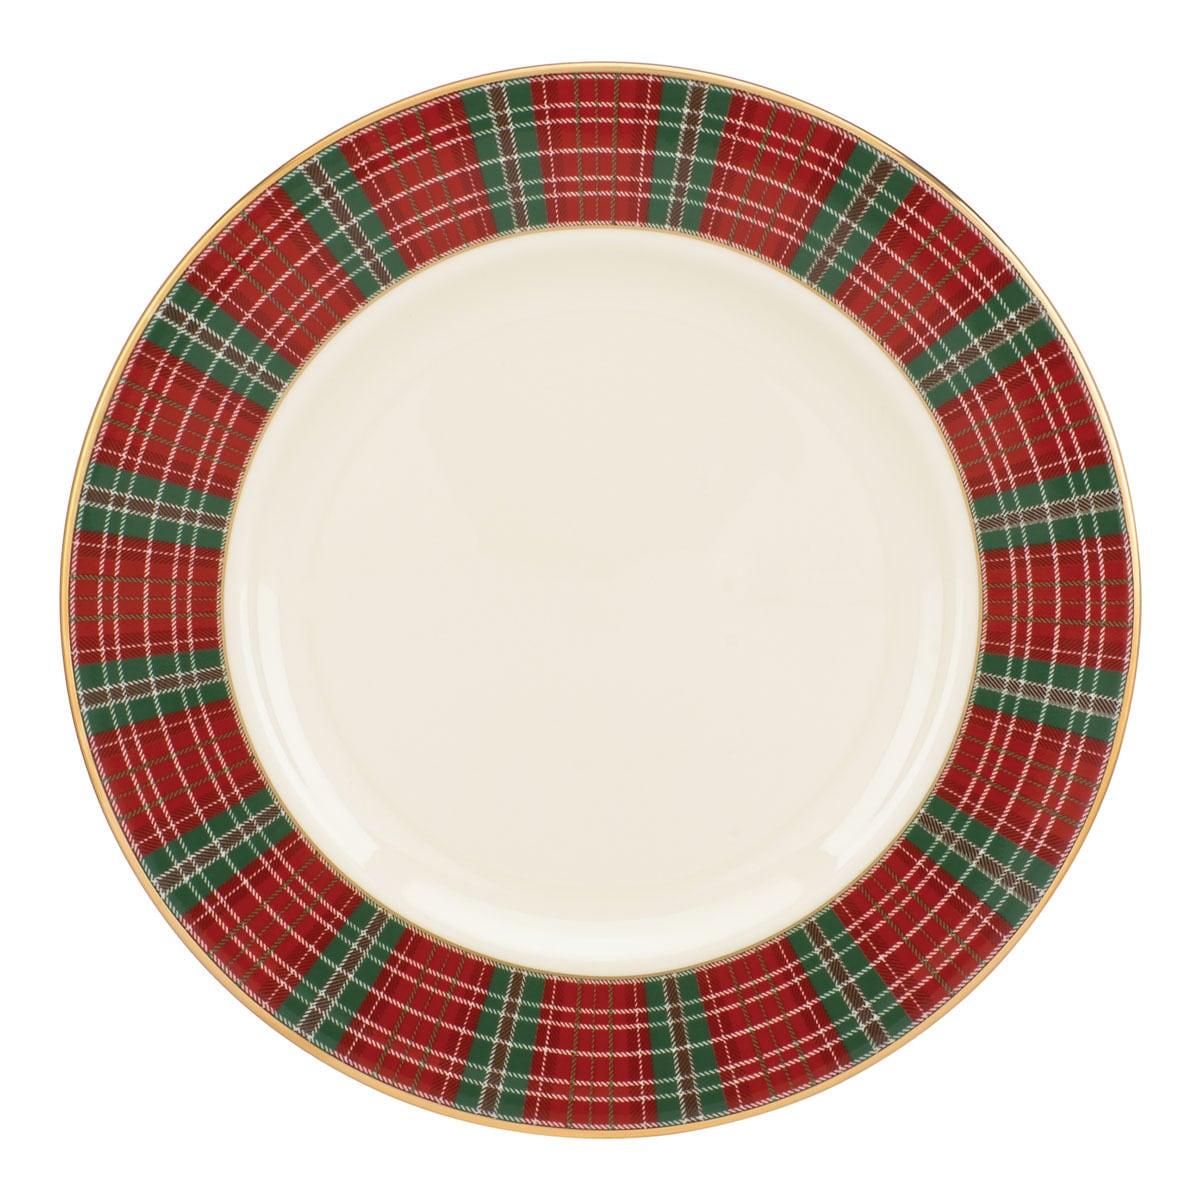 Shop Lenox Winter Greetings Plaid Salad Plate Free Shipping On